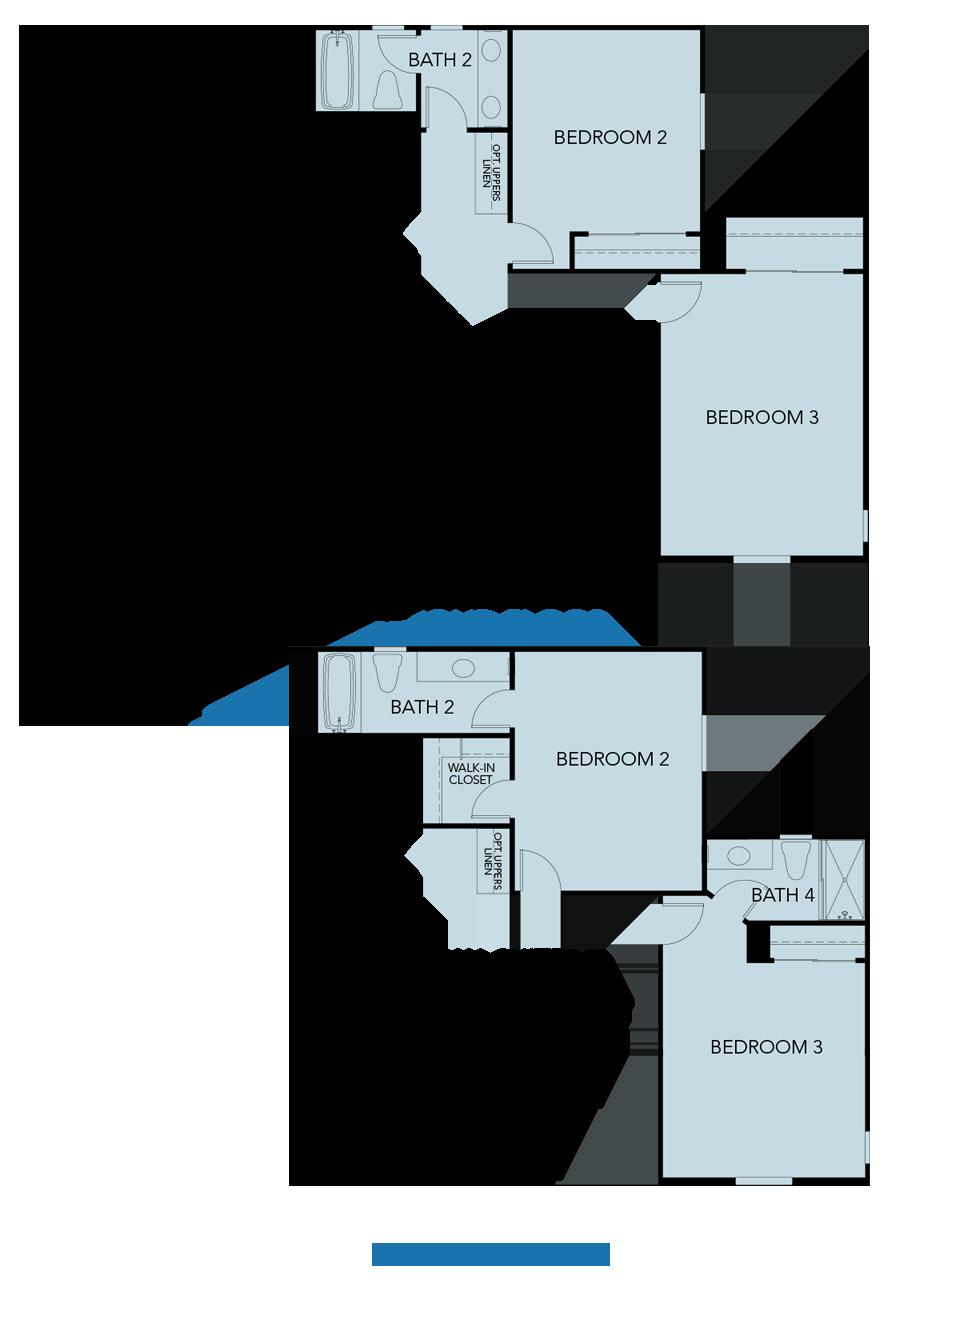 Splash at One Lake Floor Plan   Residence 3   Floor 2